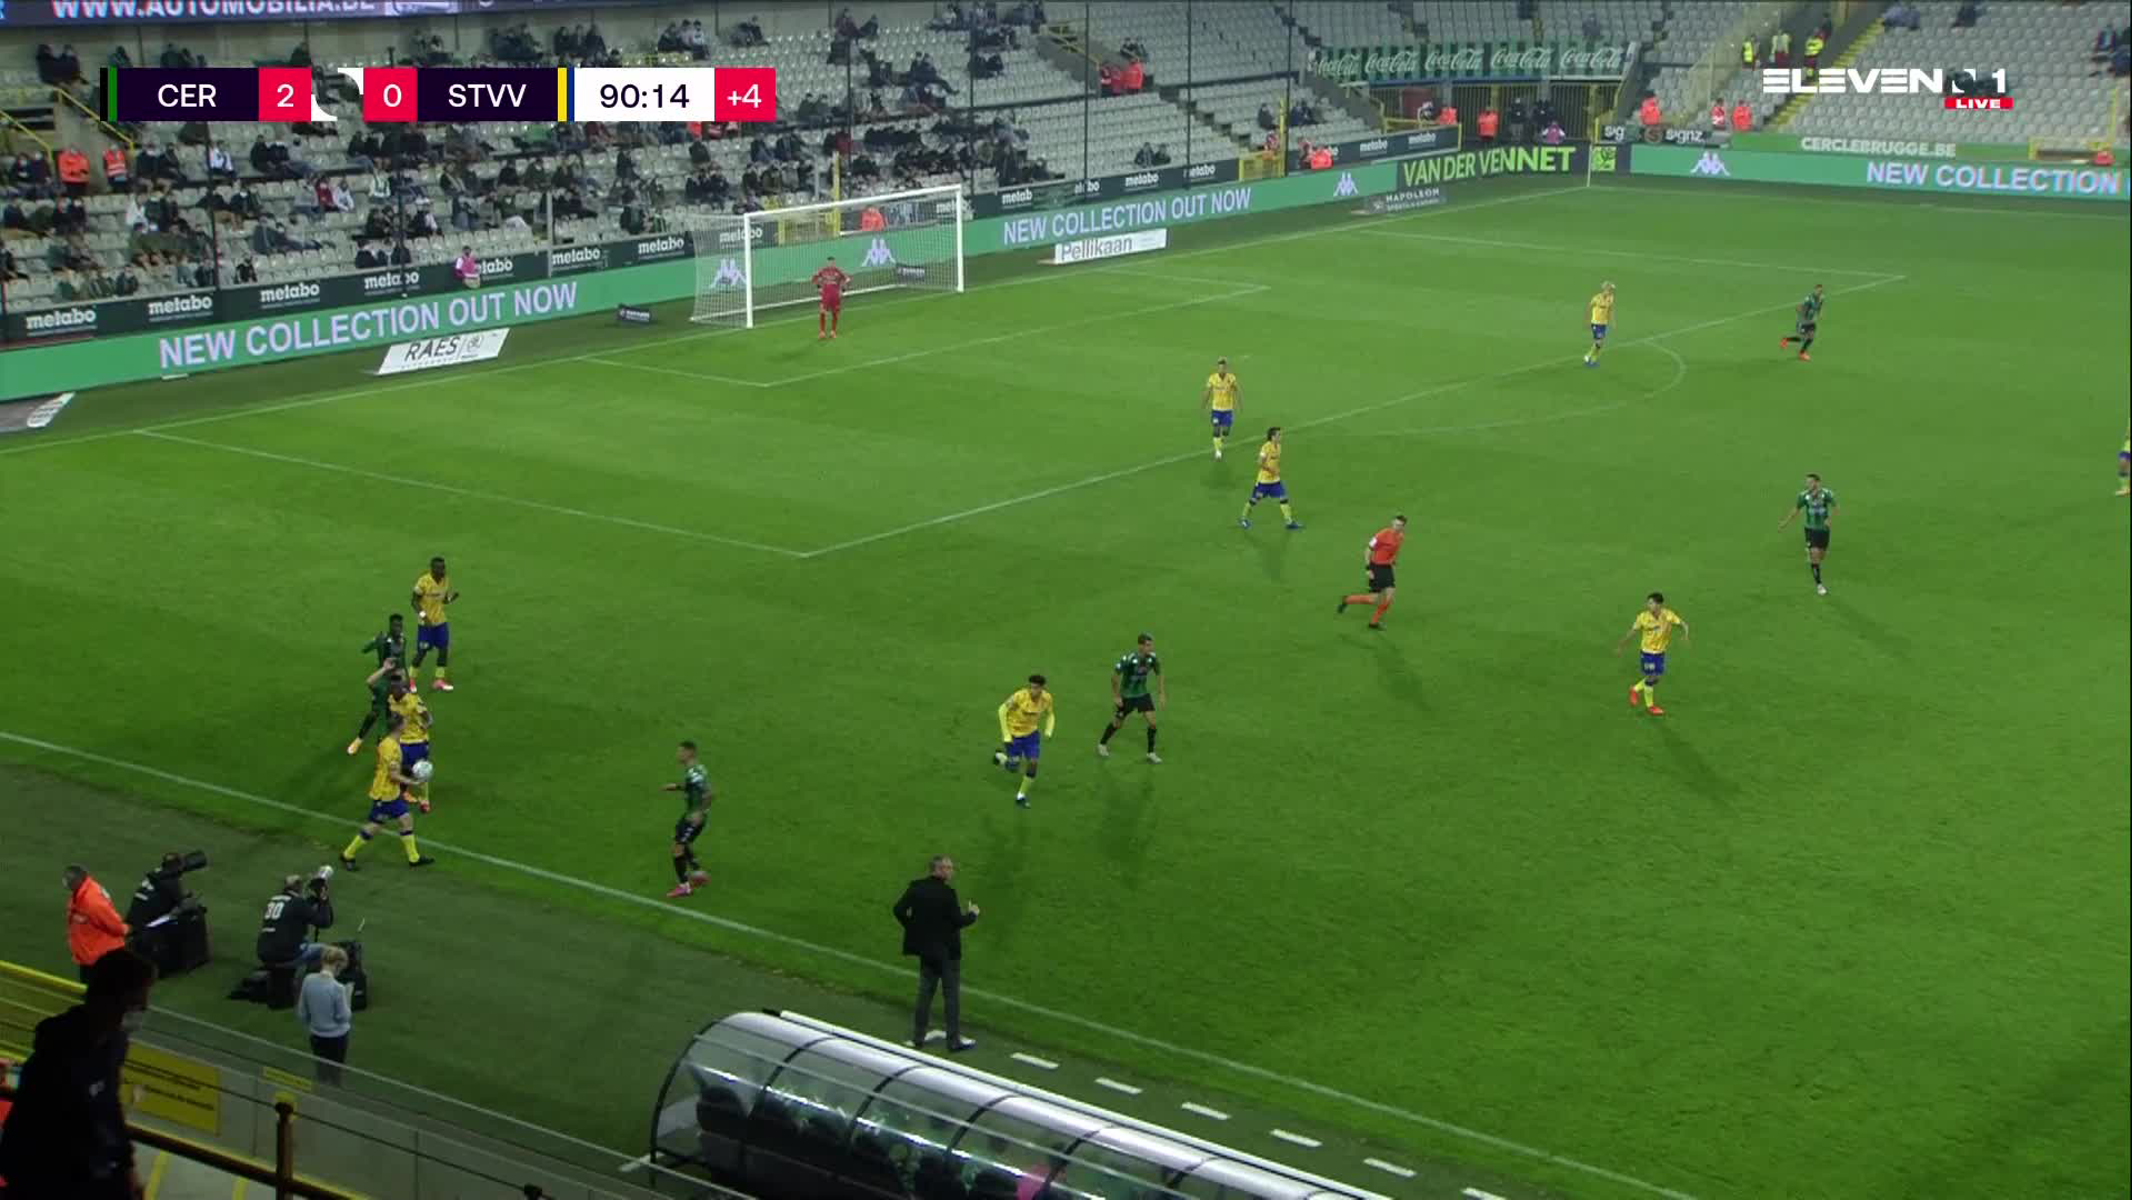 Doelpunt Victor Alexander da Silva (Cercle Brugge vs. STVV)